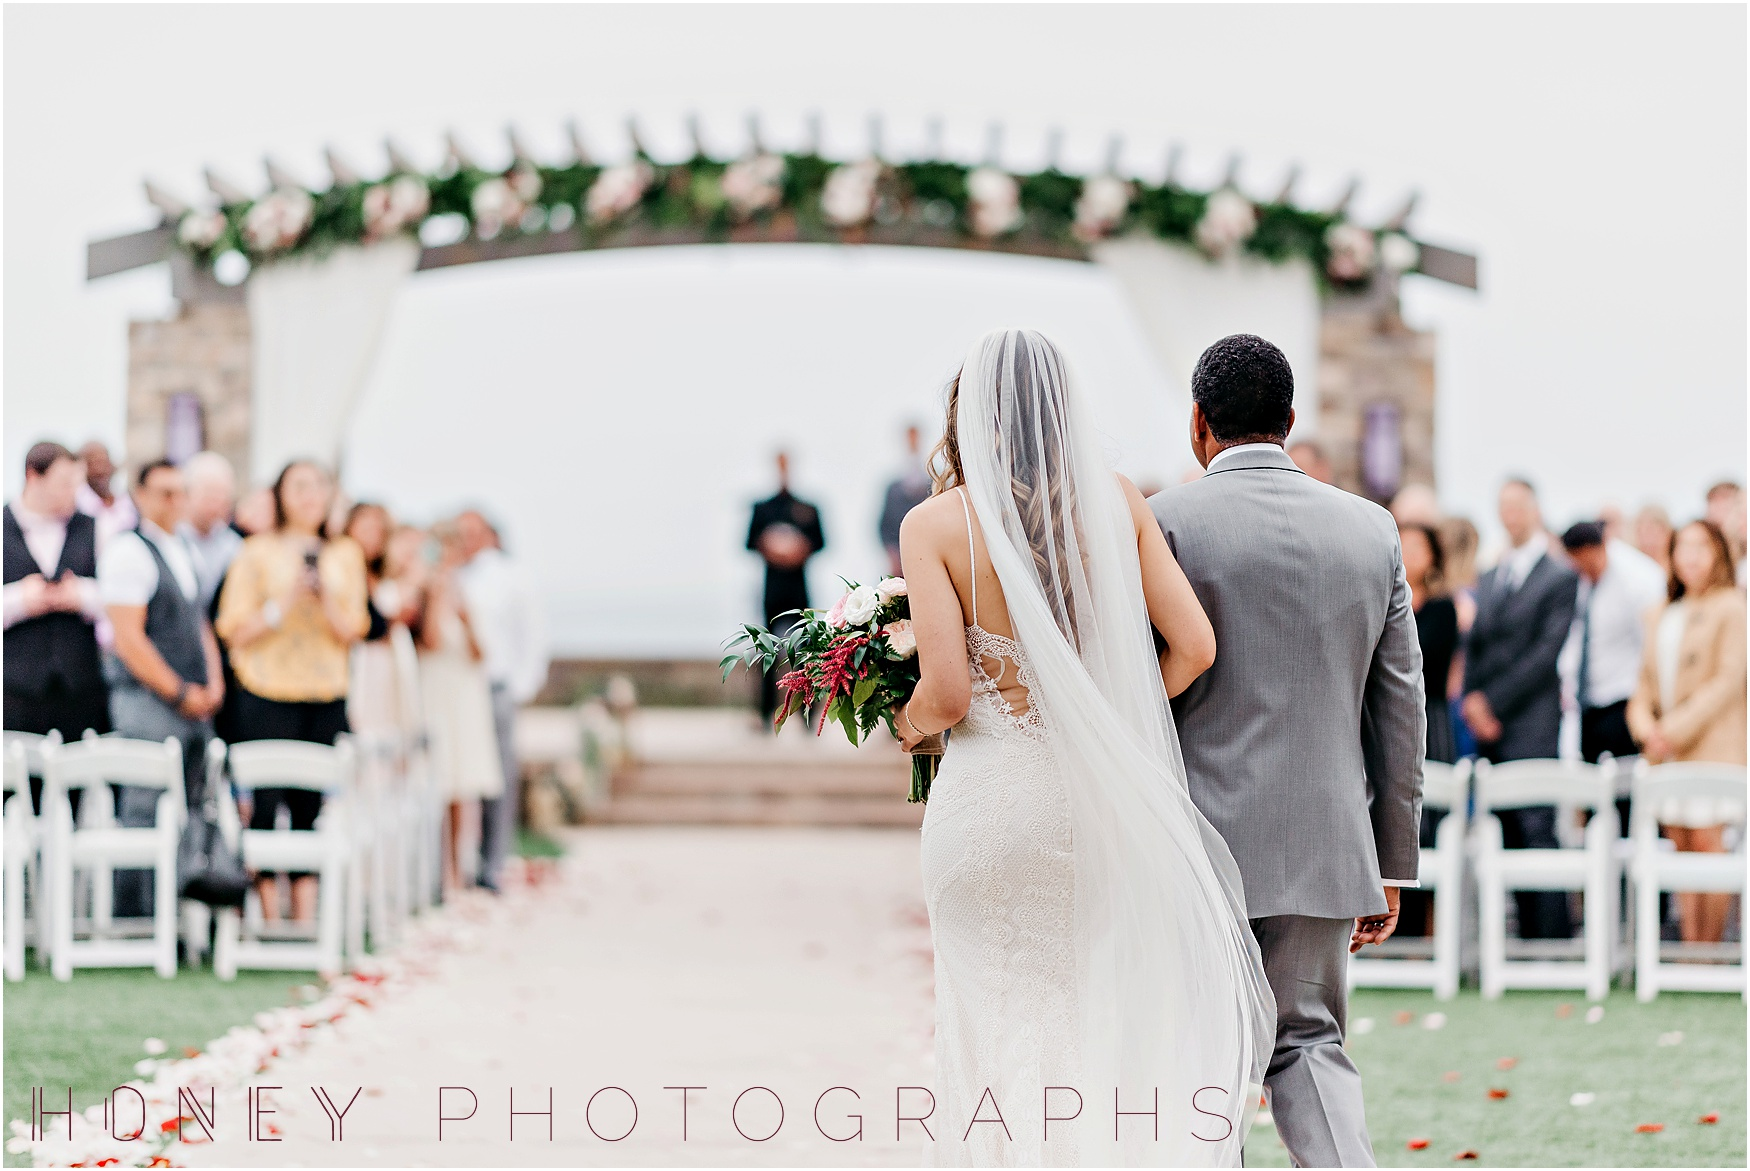 garden-classic-burgundy-jewel-tone-luxury-pacific-event-oceanside-wedding22.jpg